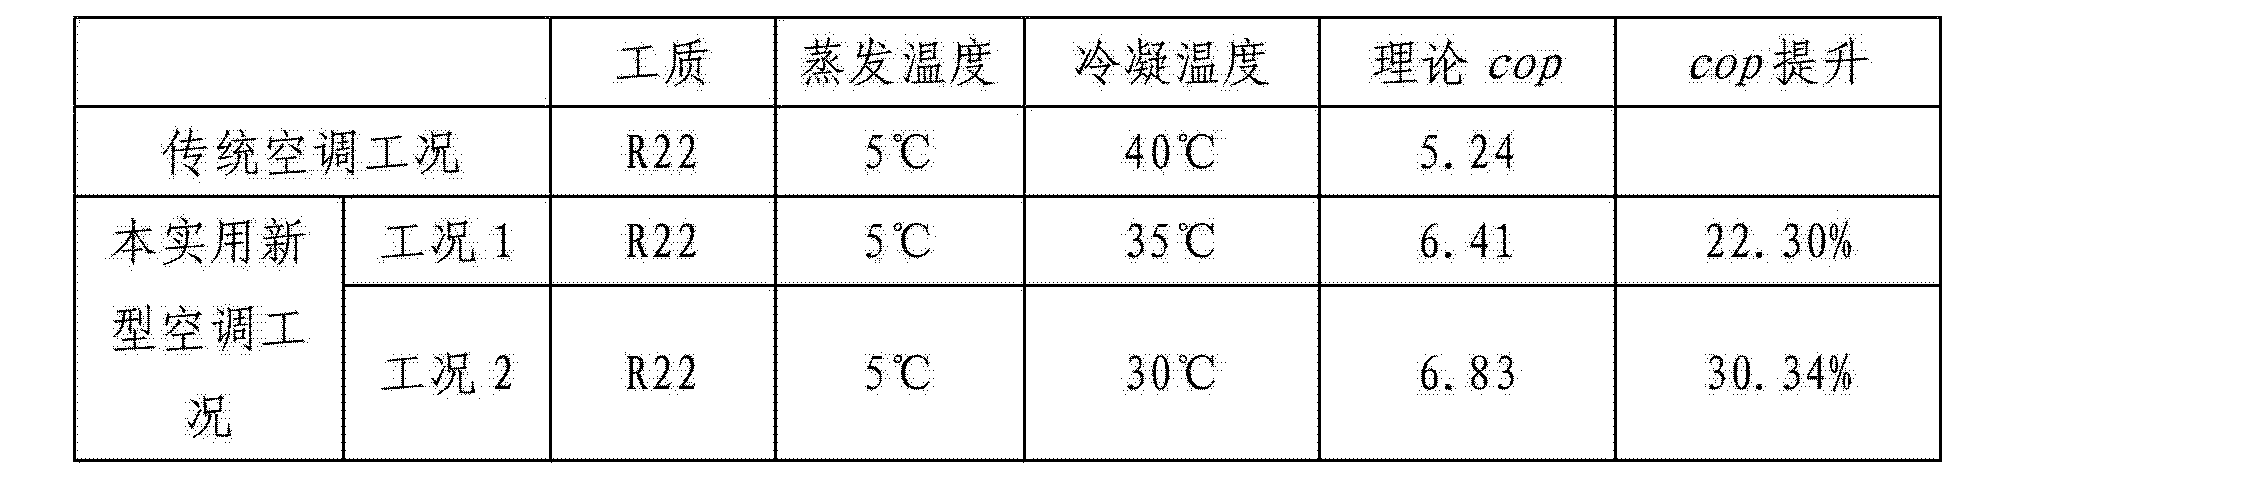 Figure CN202853020UD00062